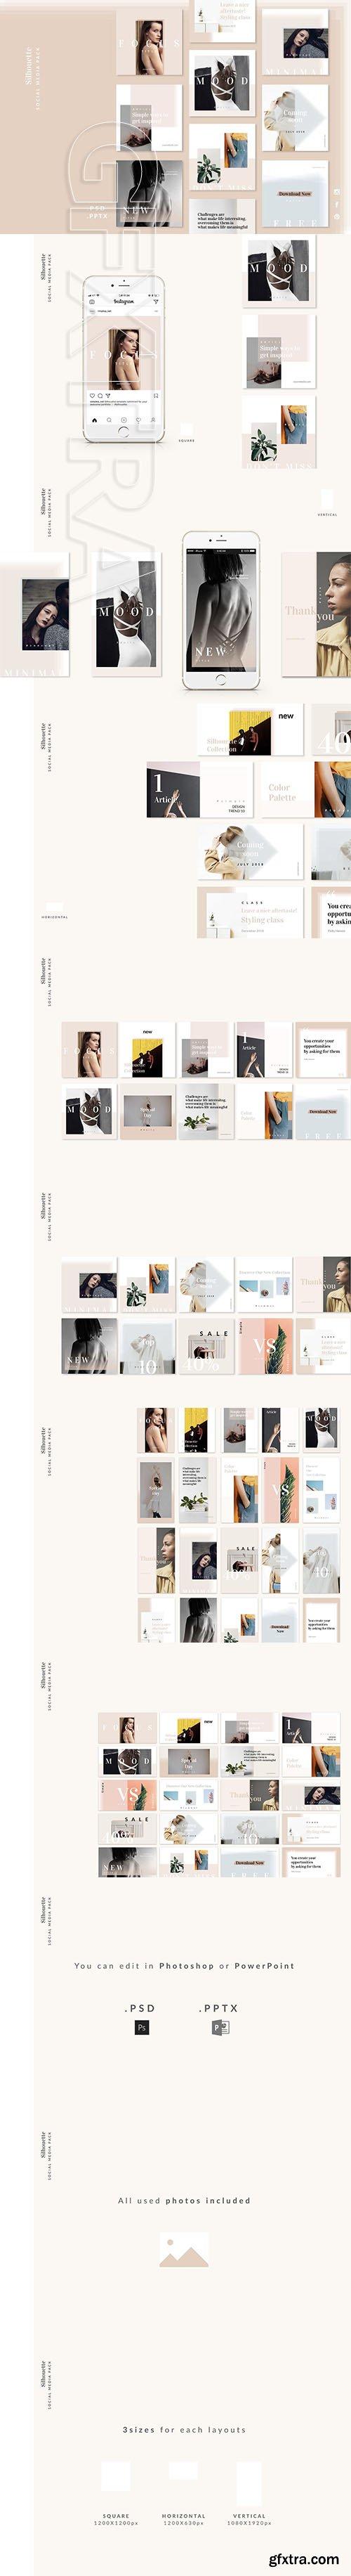 CreativeMarket - Silhouette Social Media Pack 2657319